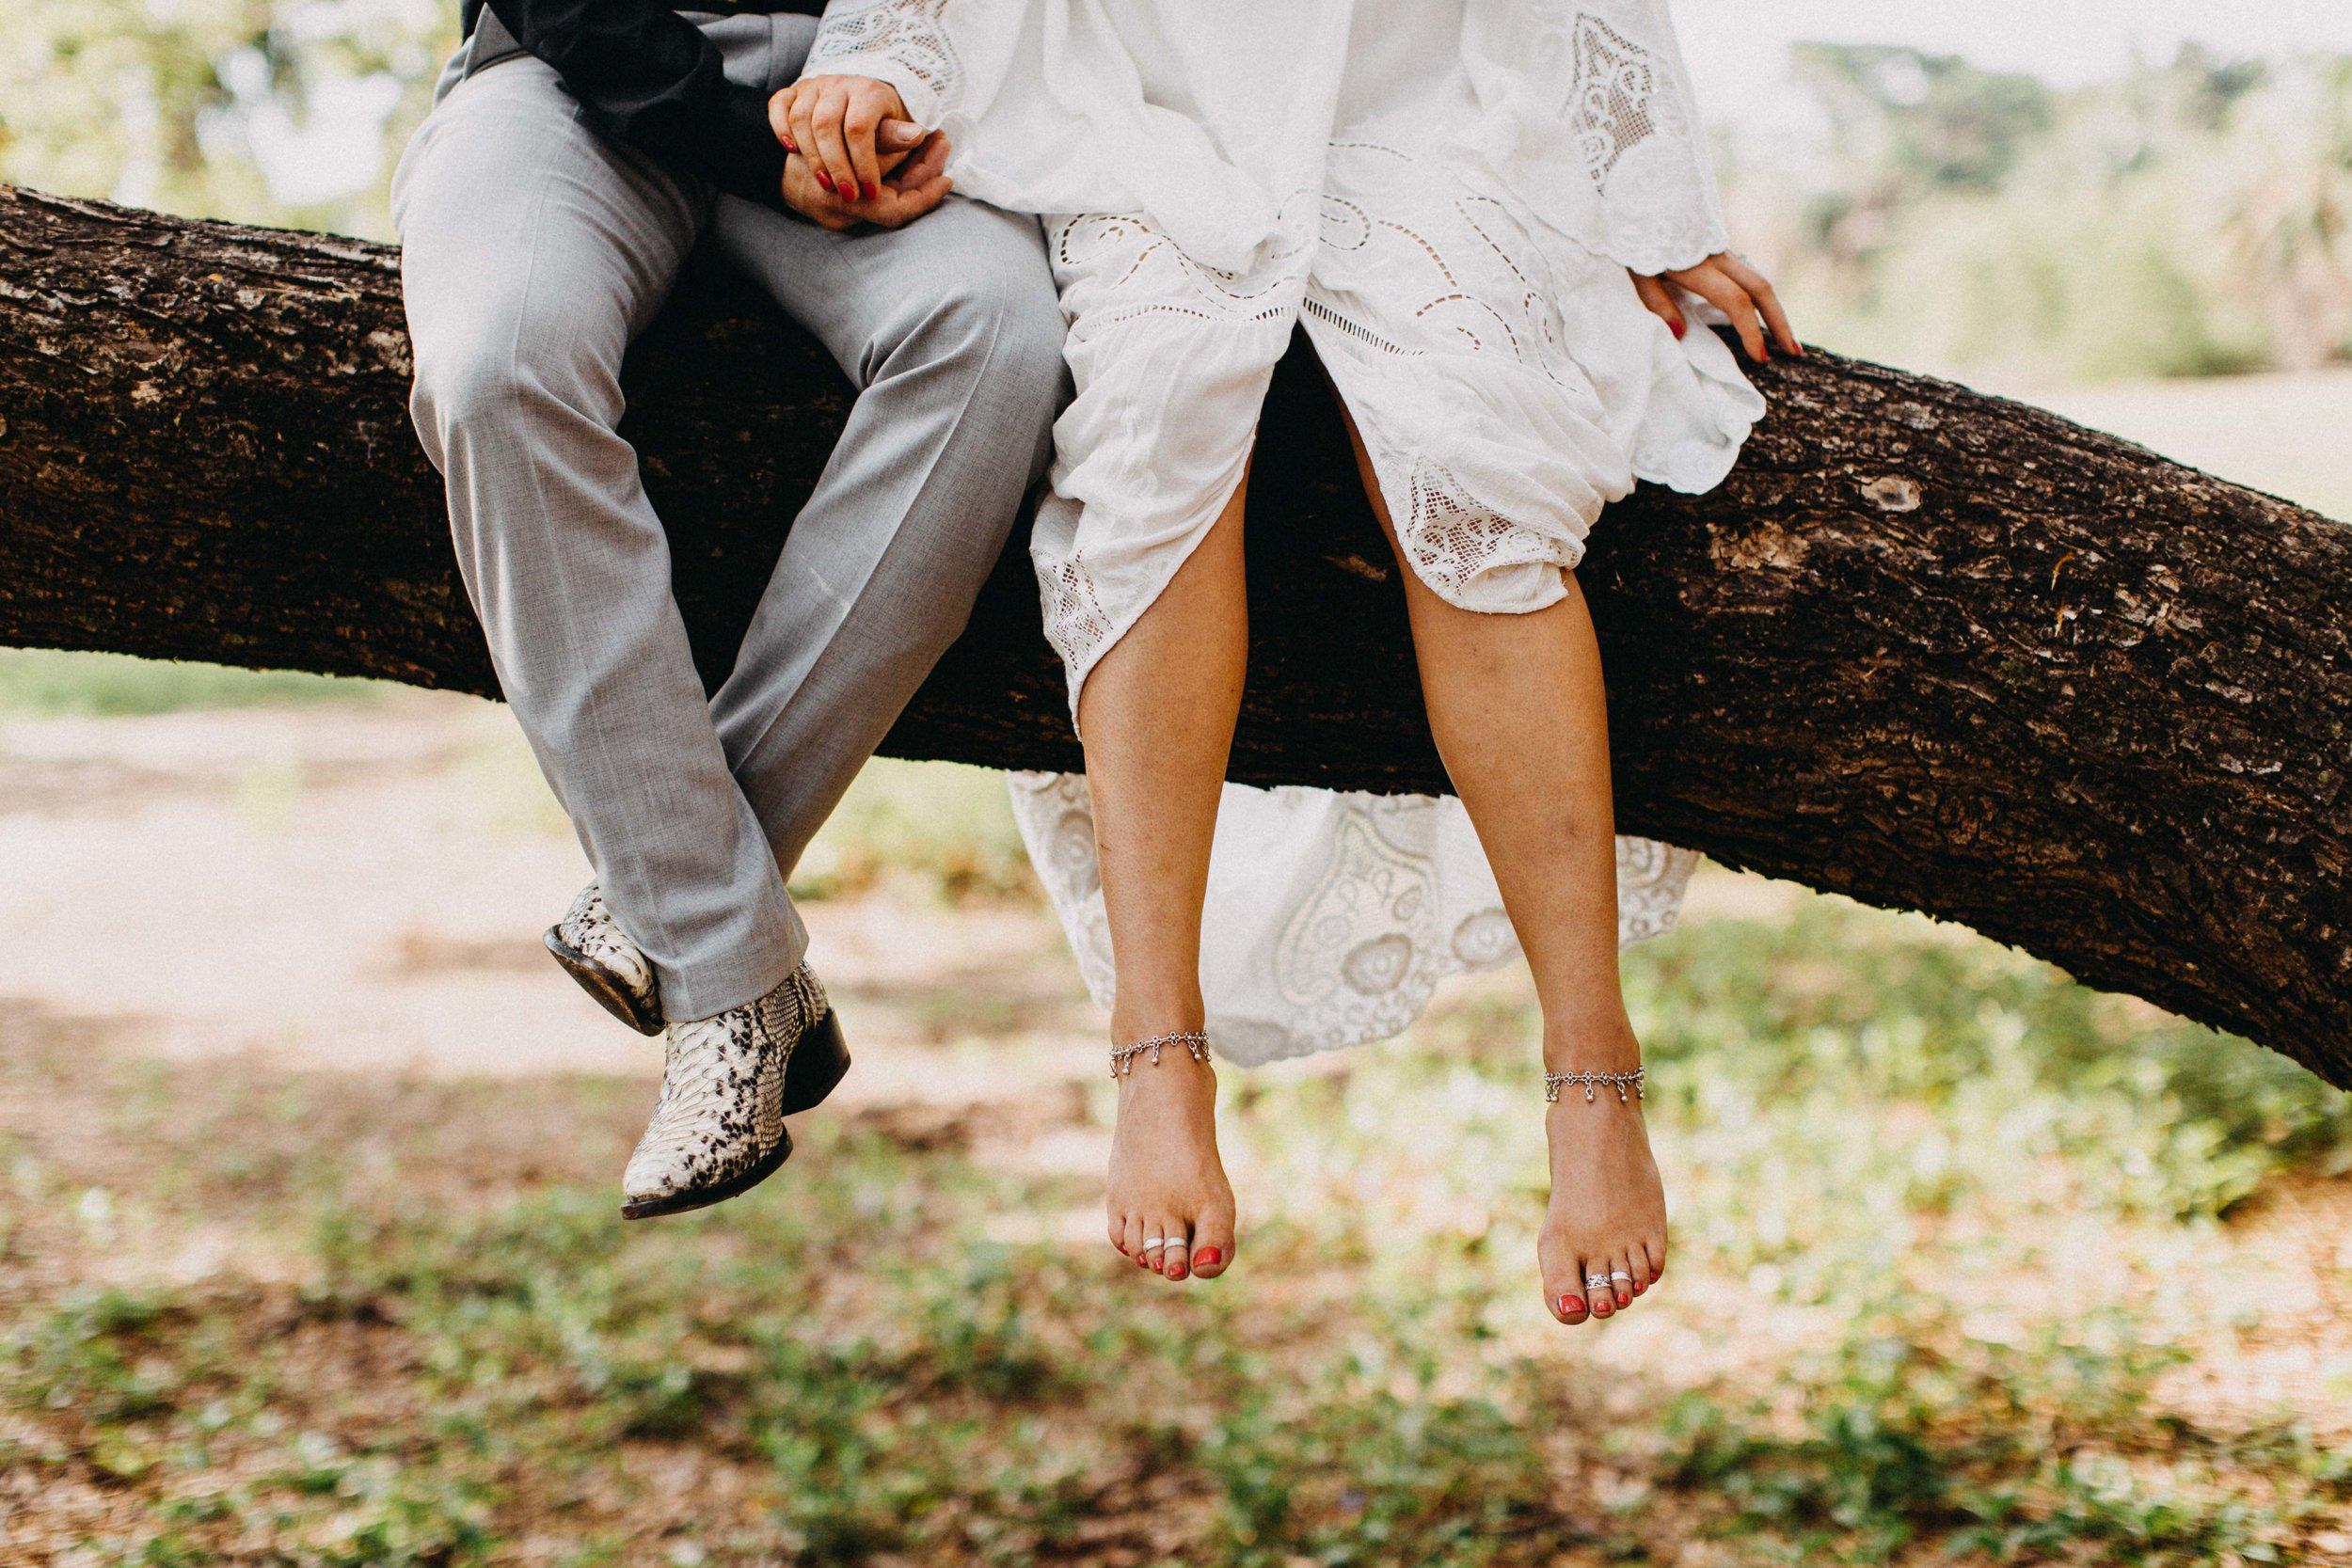 darwin-elopement-wedding-beach-camden-photography-www.emilyobrienphotography.net-37.jpg